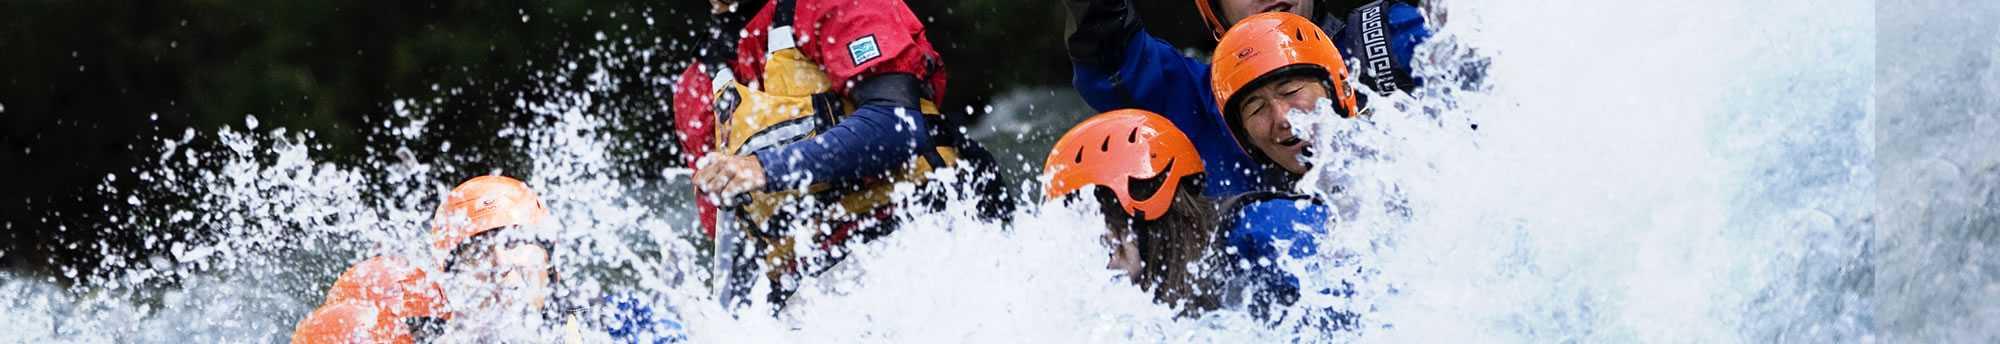 Rafting Eseraventura - Valle de Benasque